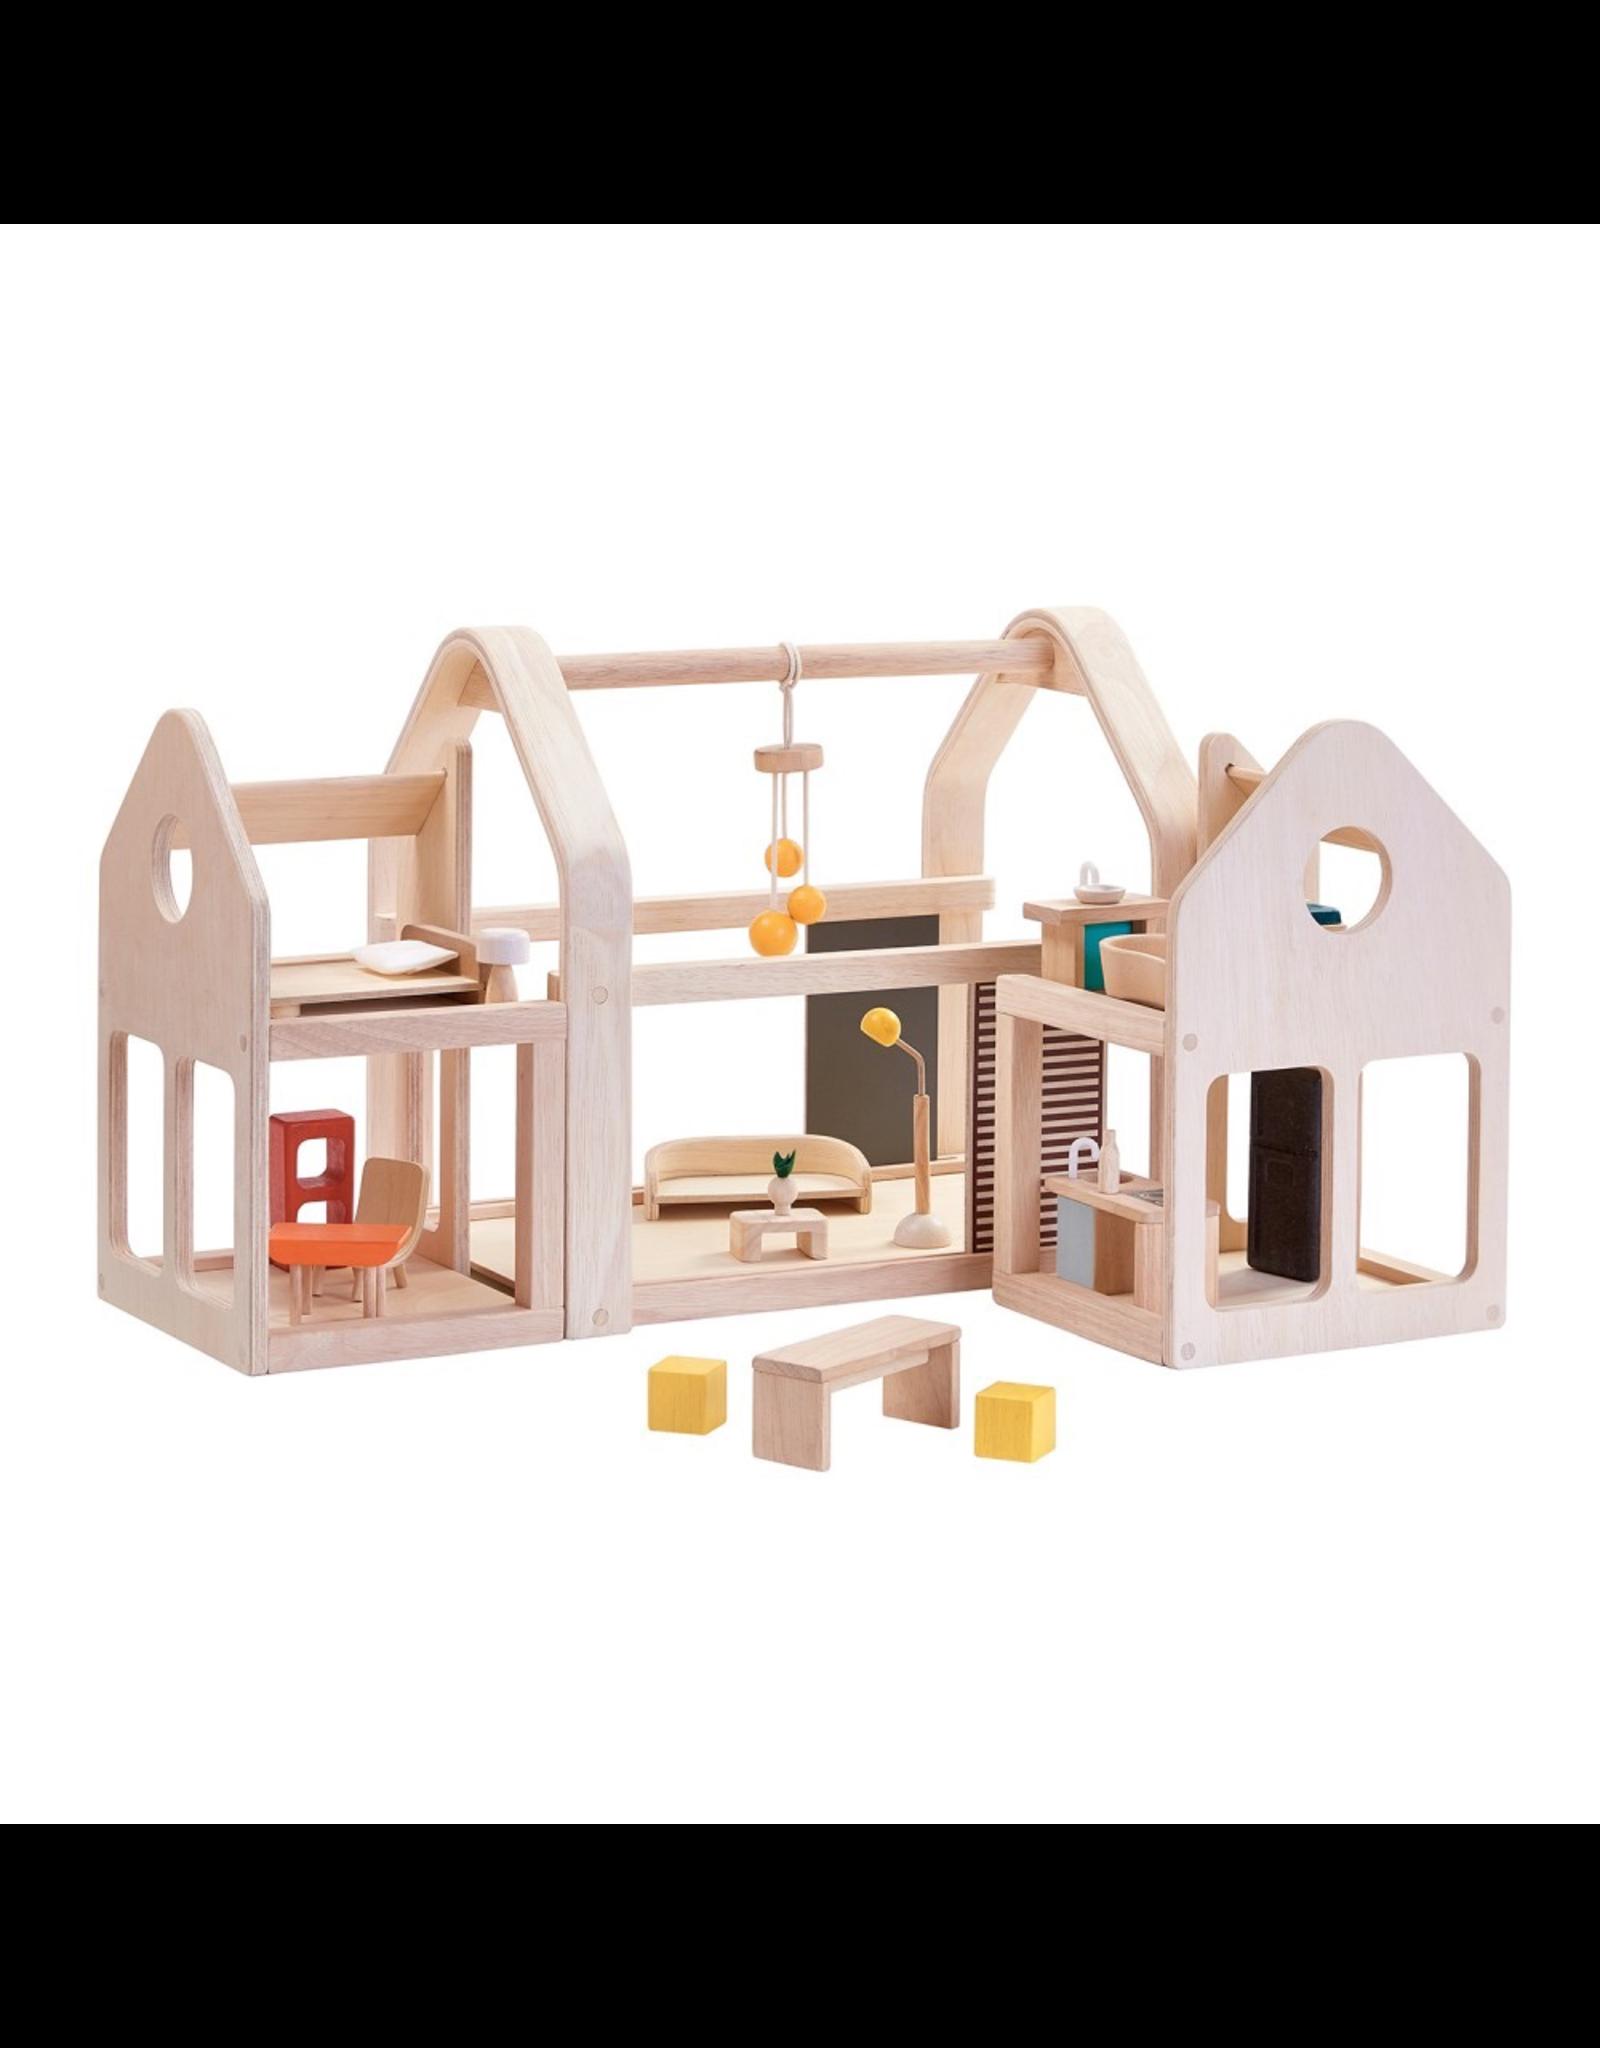 Plan Toys Slide N Go Dollhouse By Plan Toys